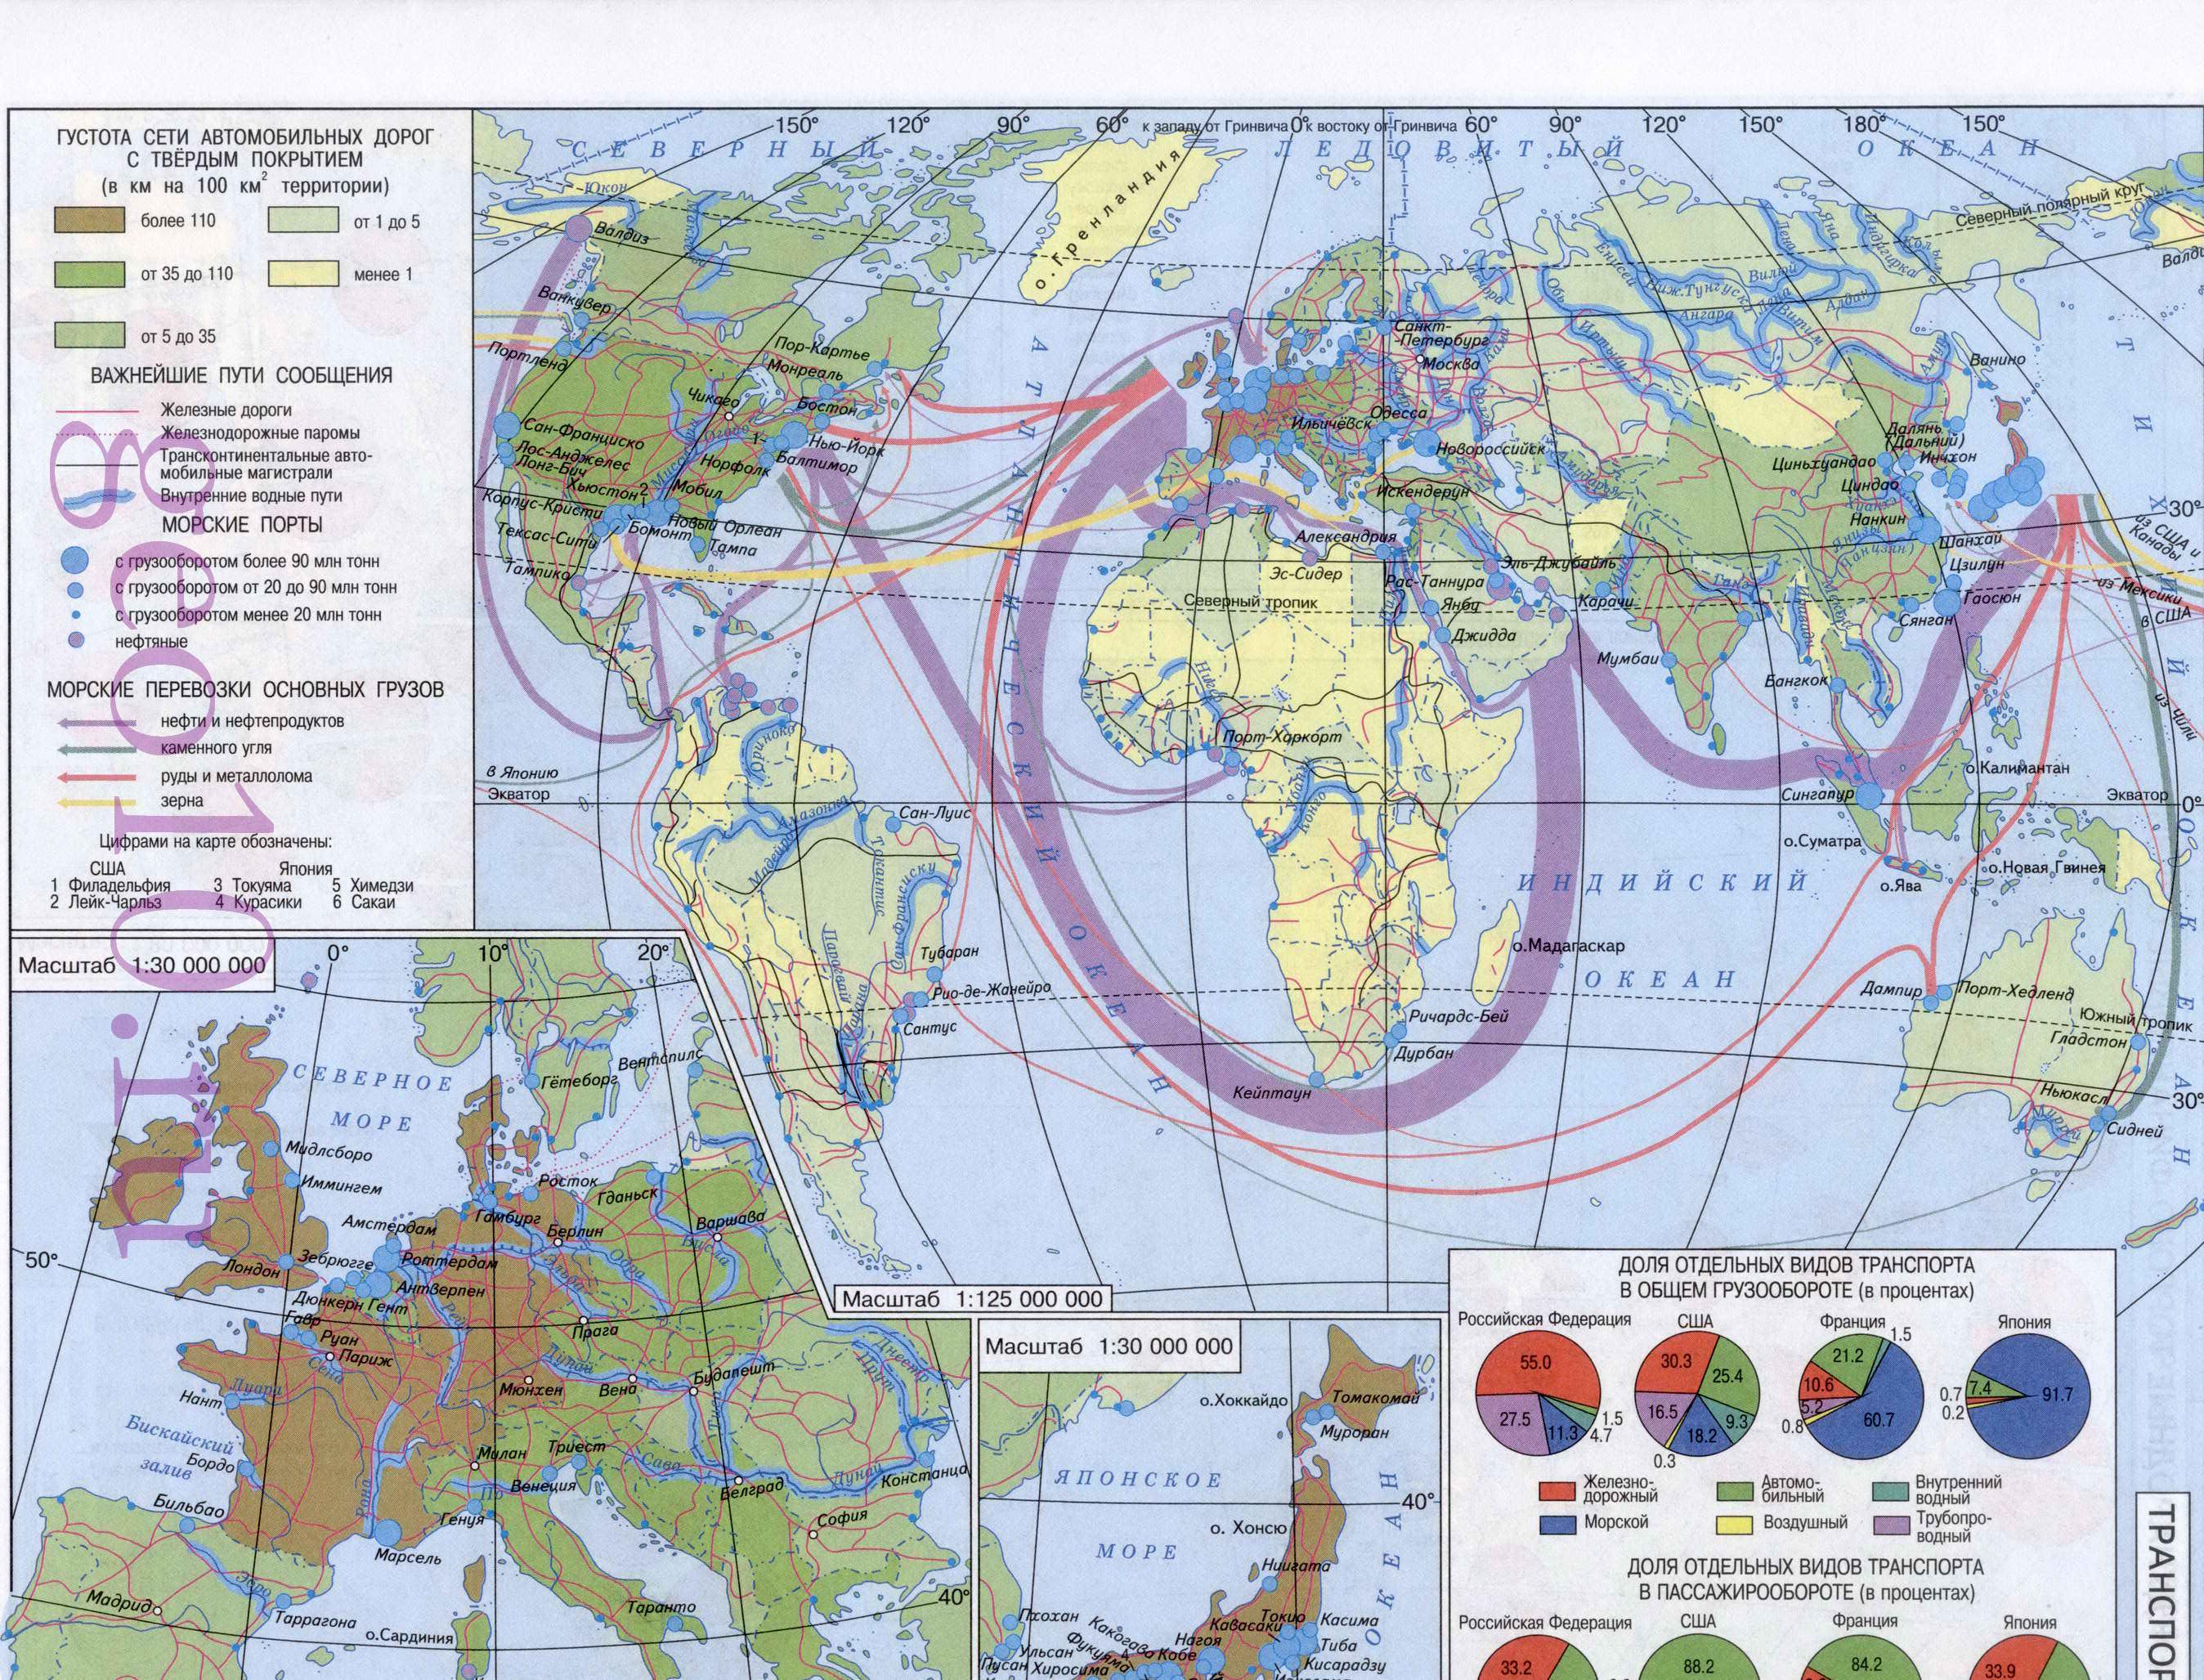 контурная карта мира - Сумки: http://sumkeshop.ru/konturnaya-karta-mira.html